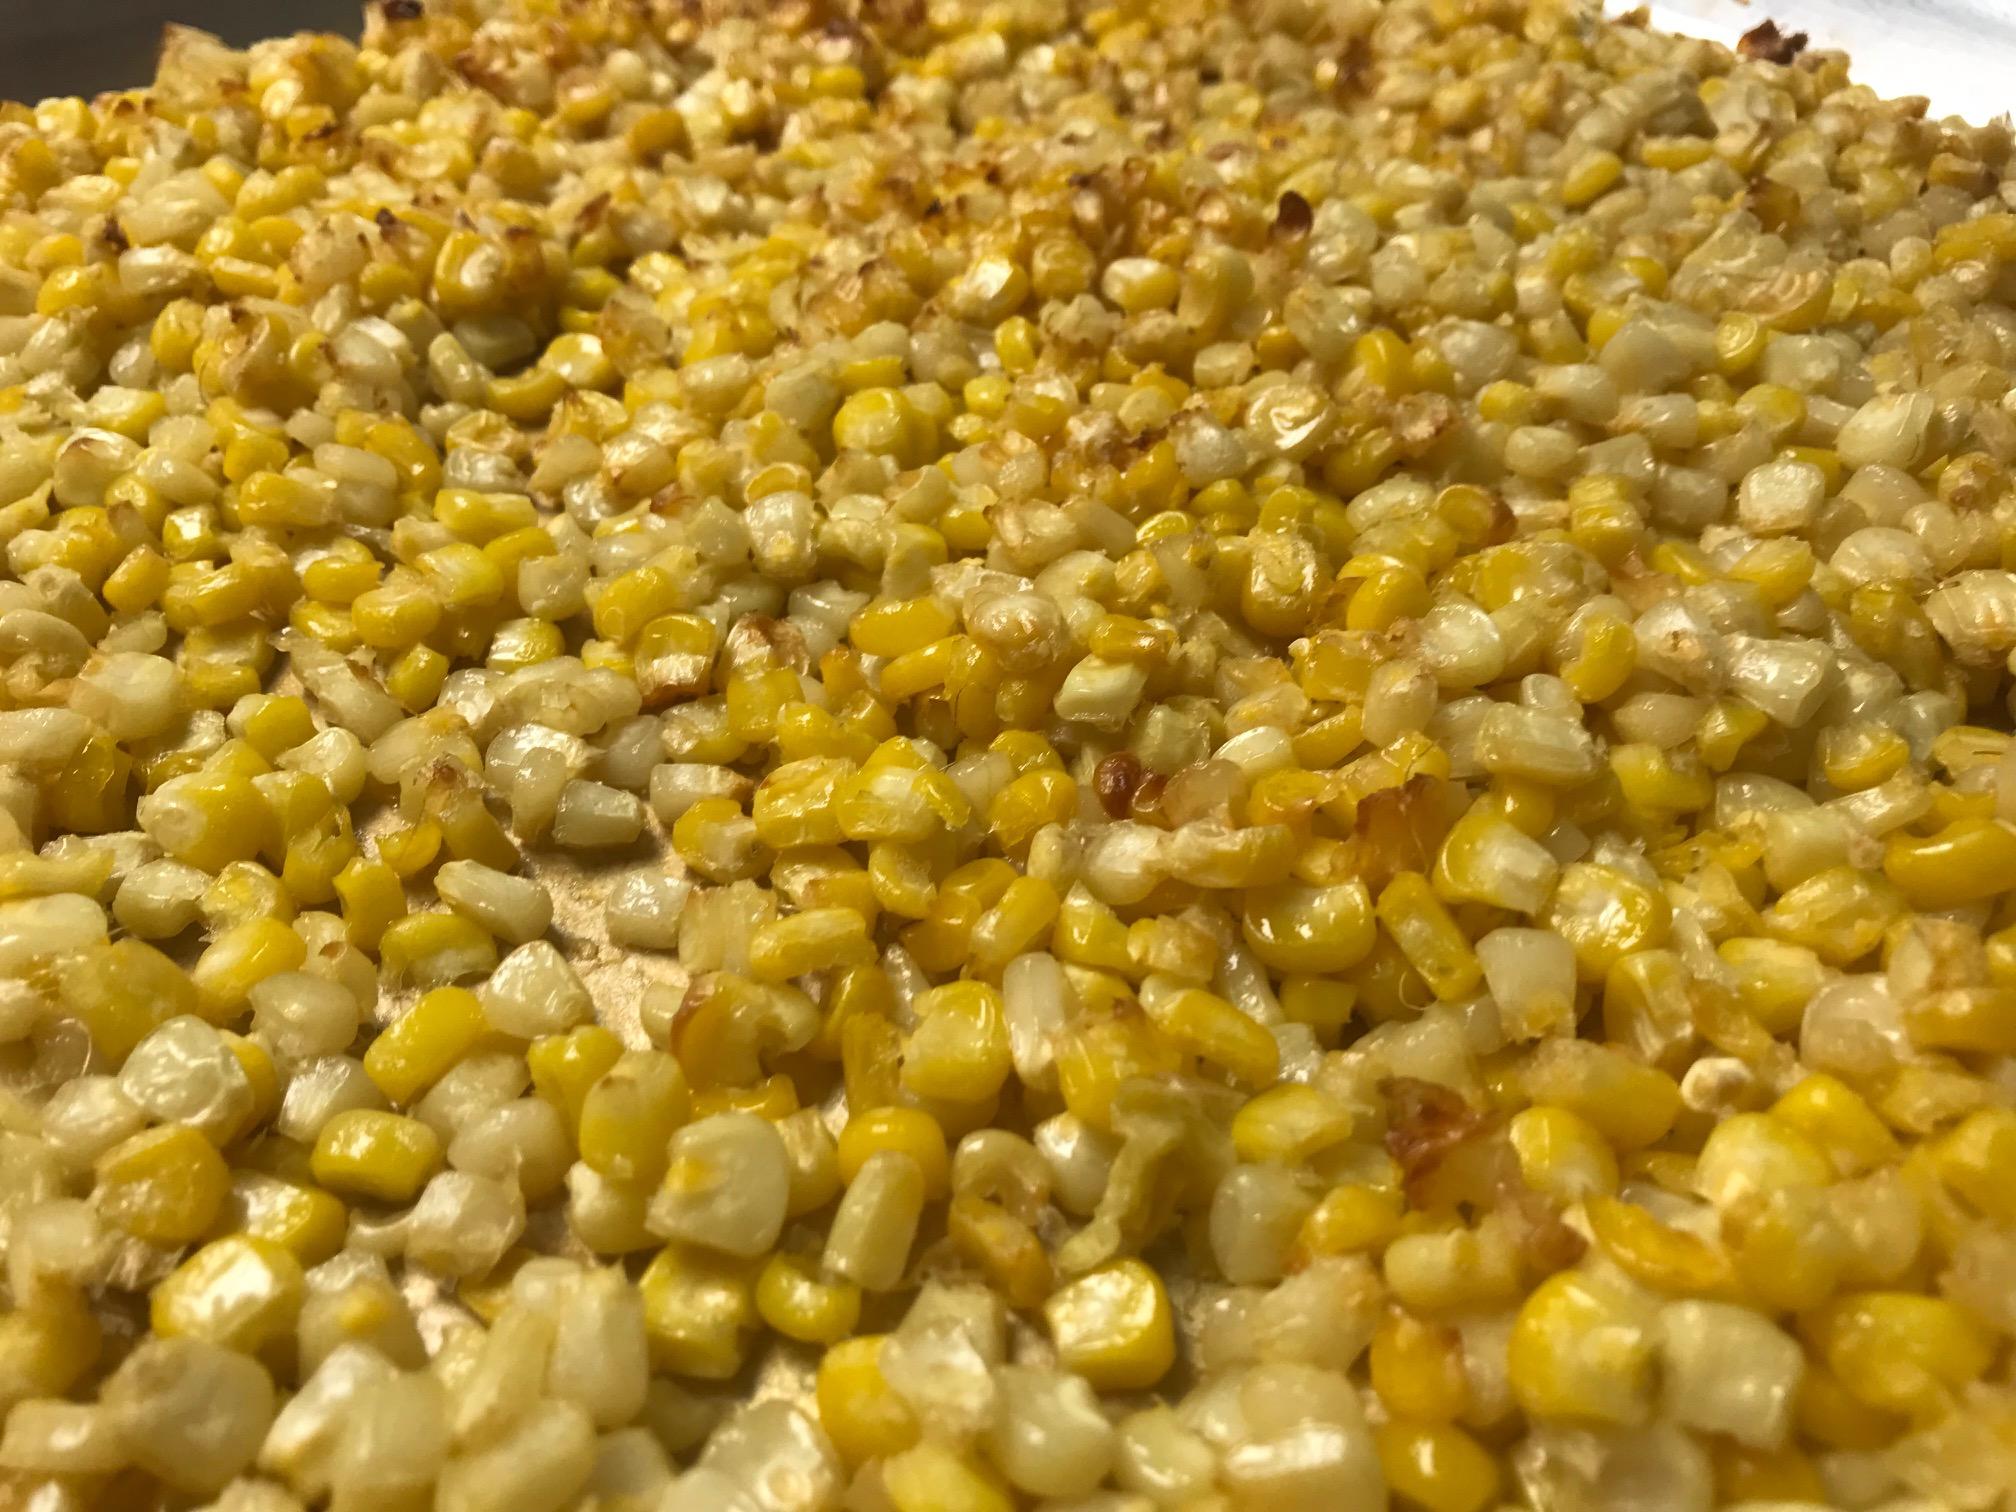 Yellow Corn roasted